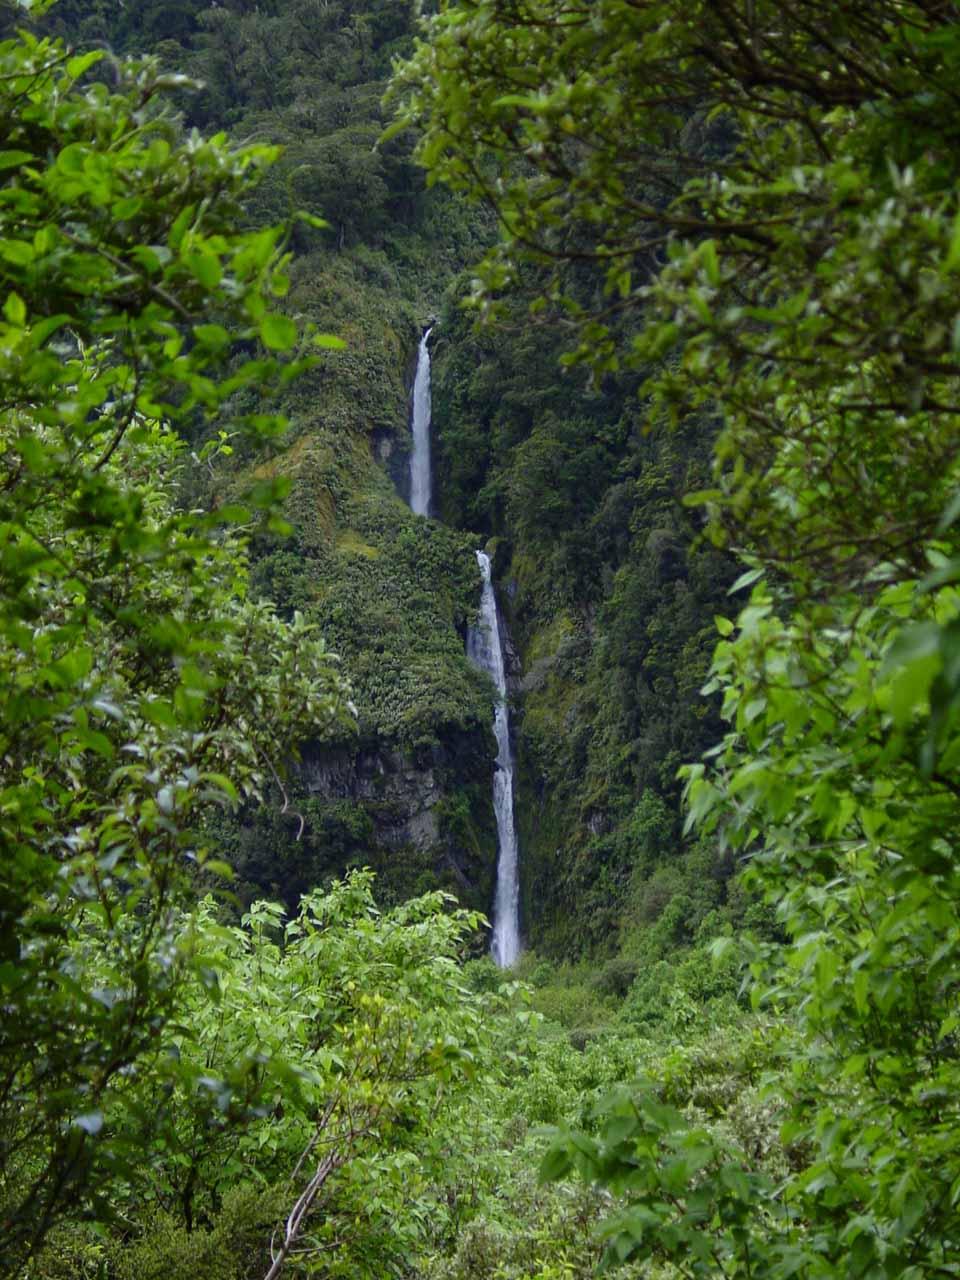 Closer examination of St Quintin Falls